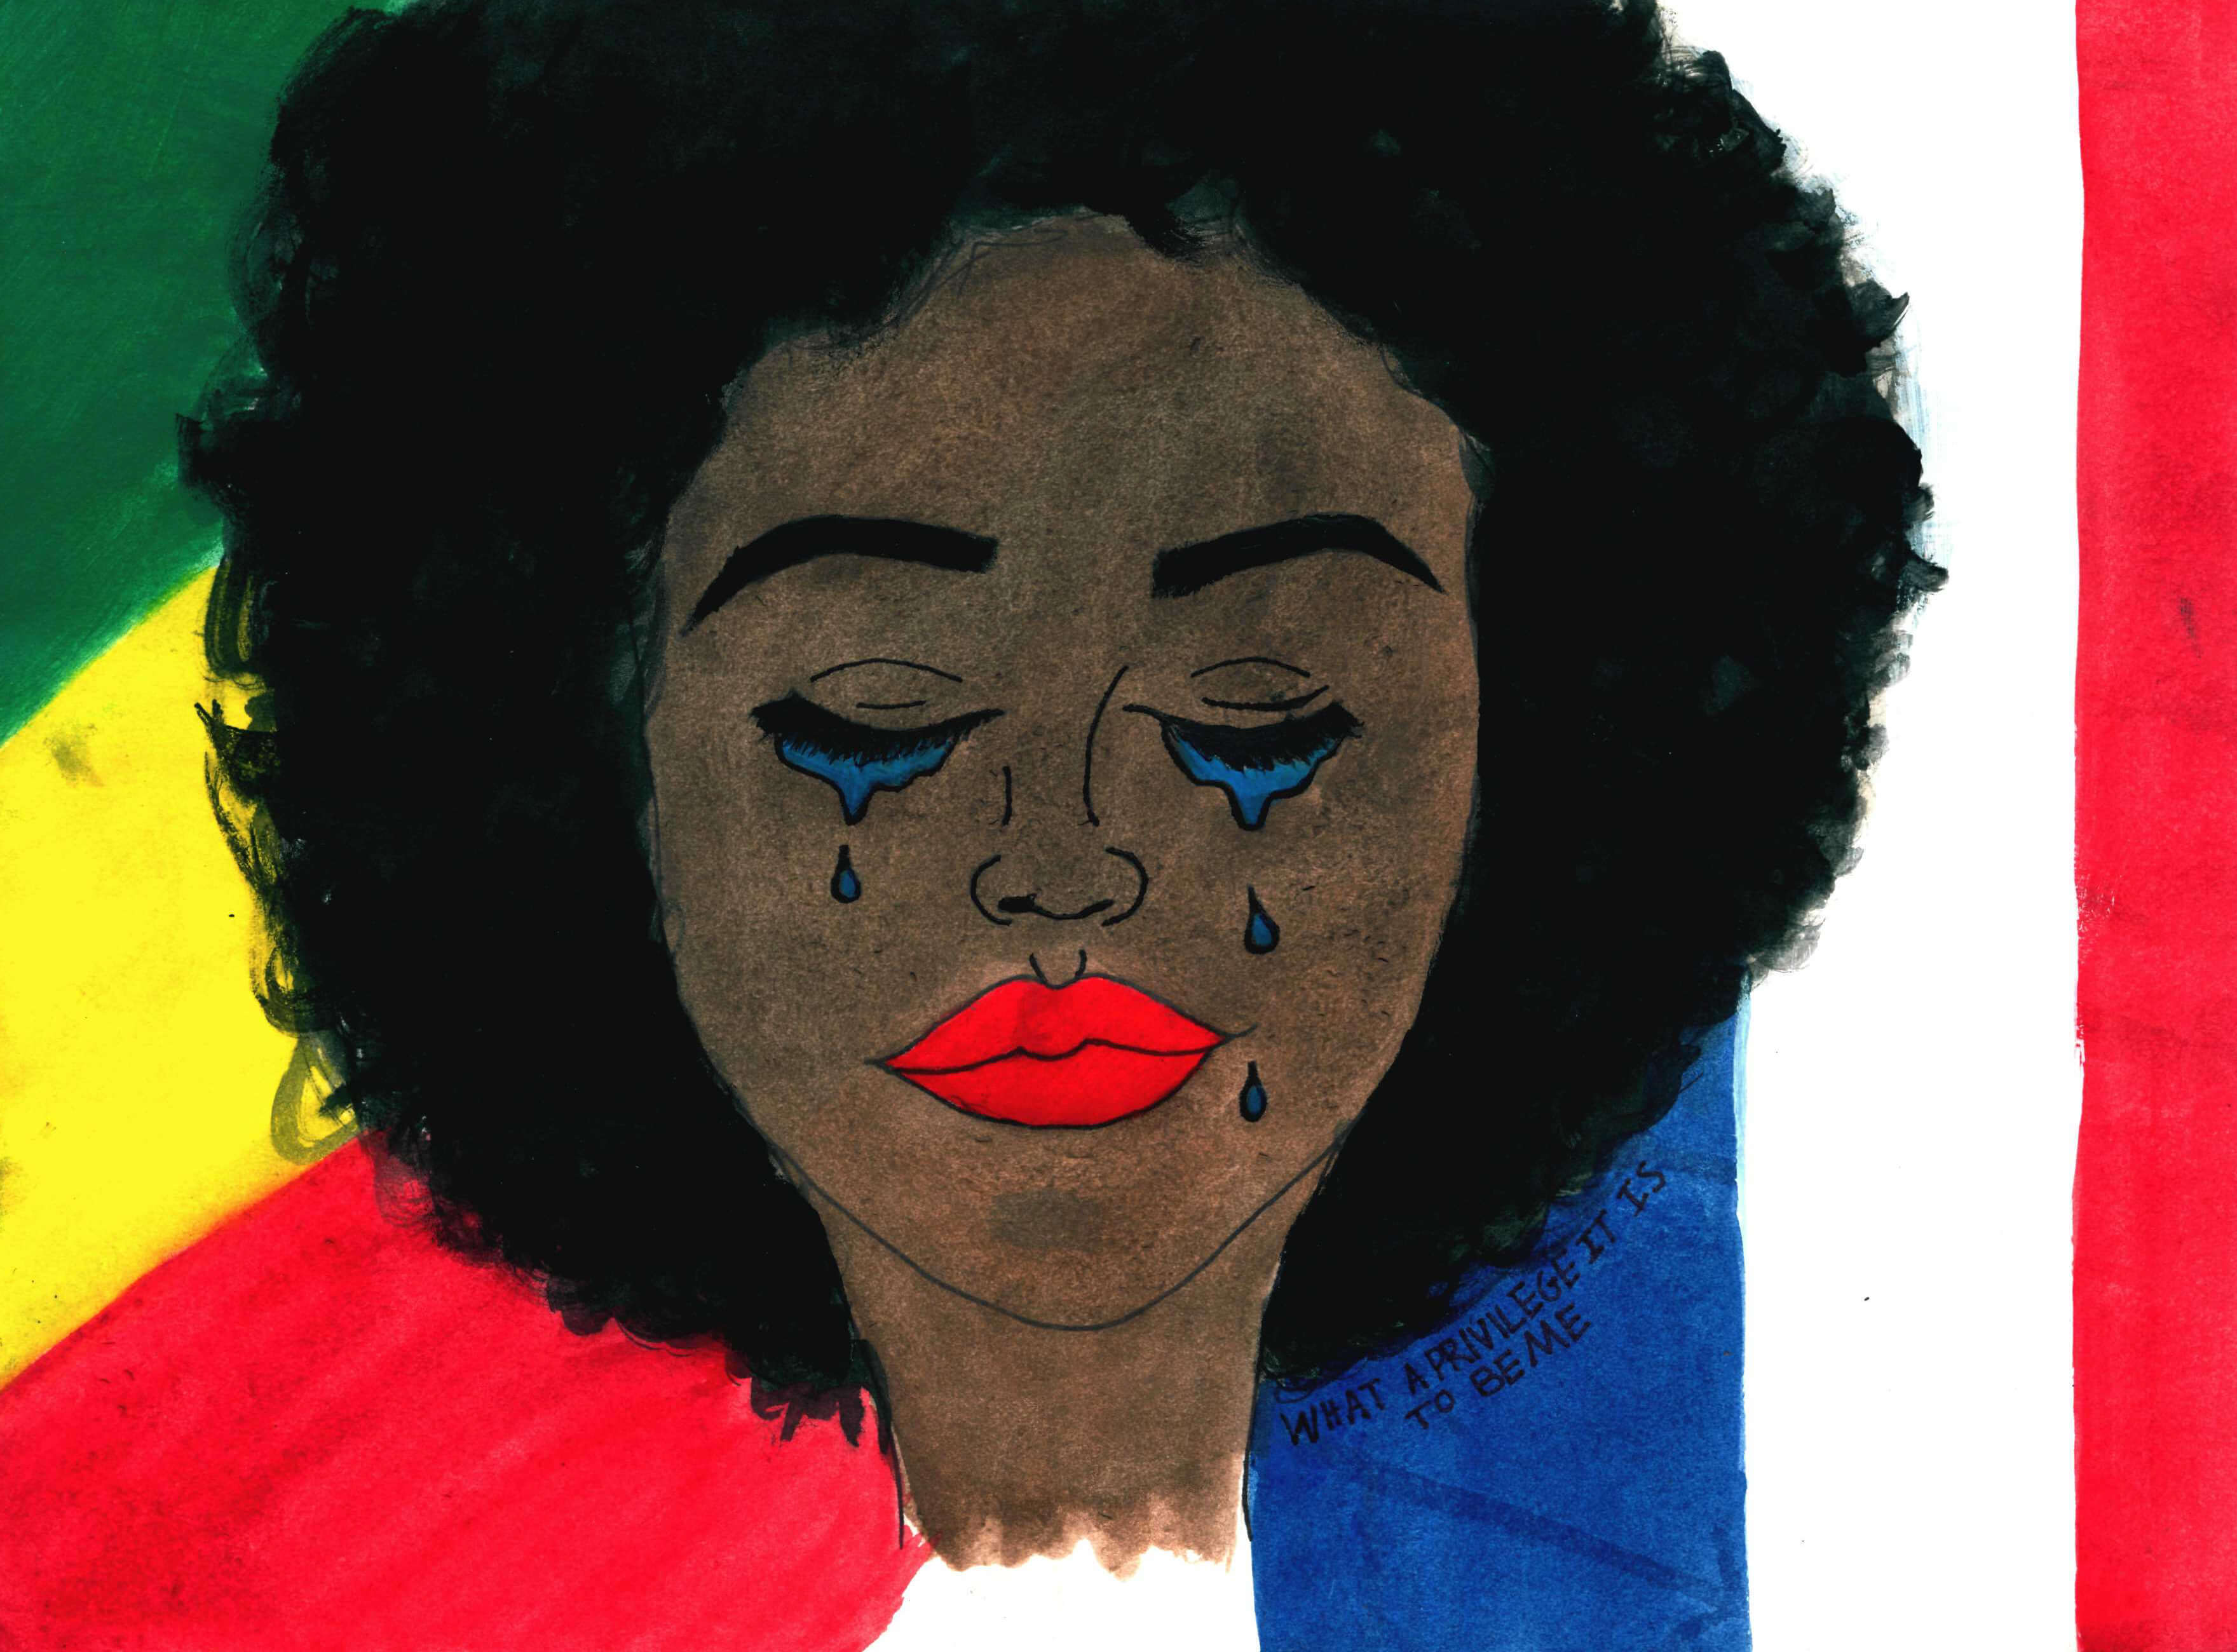 Illustration by Amil Barlow.